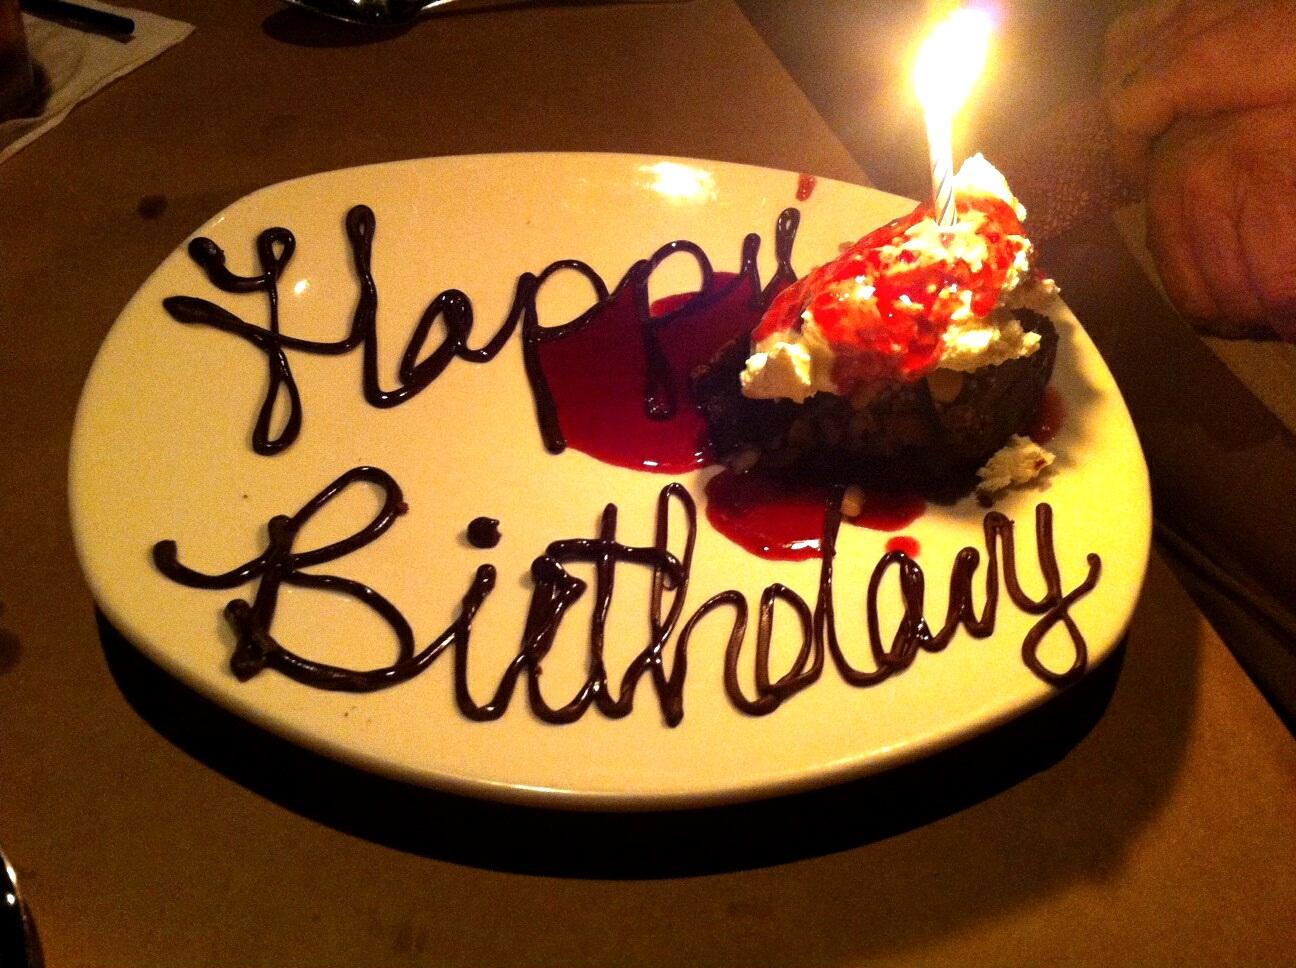 Tulsa Gentleman Happy Birthday to Susan